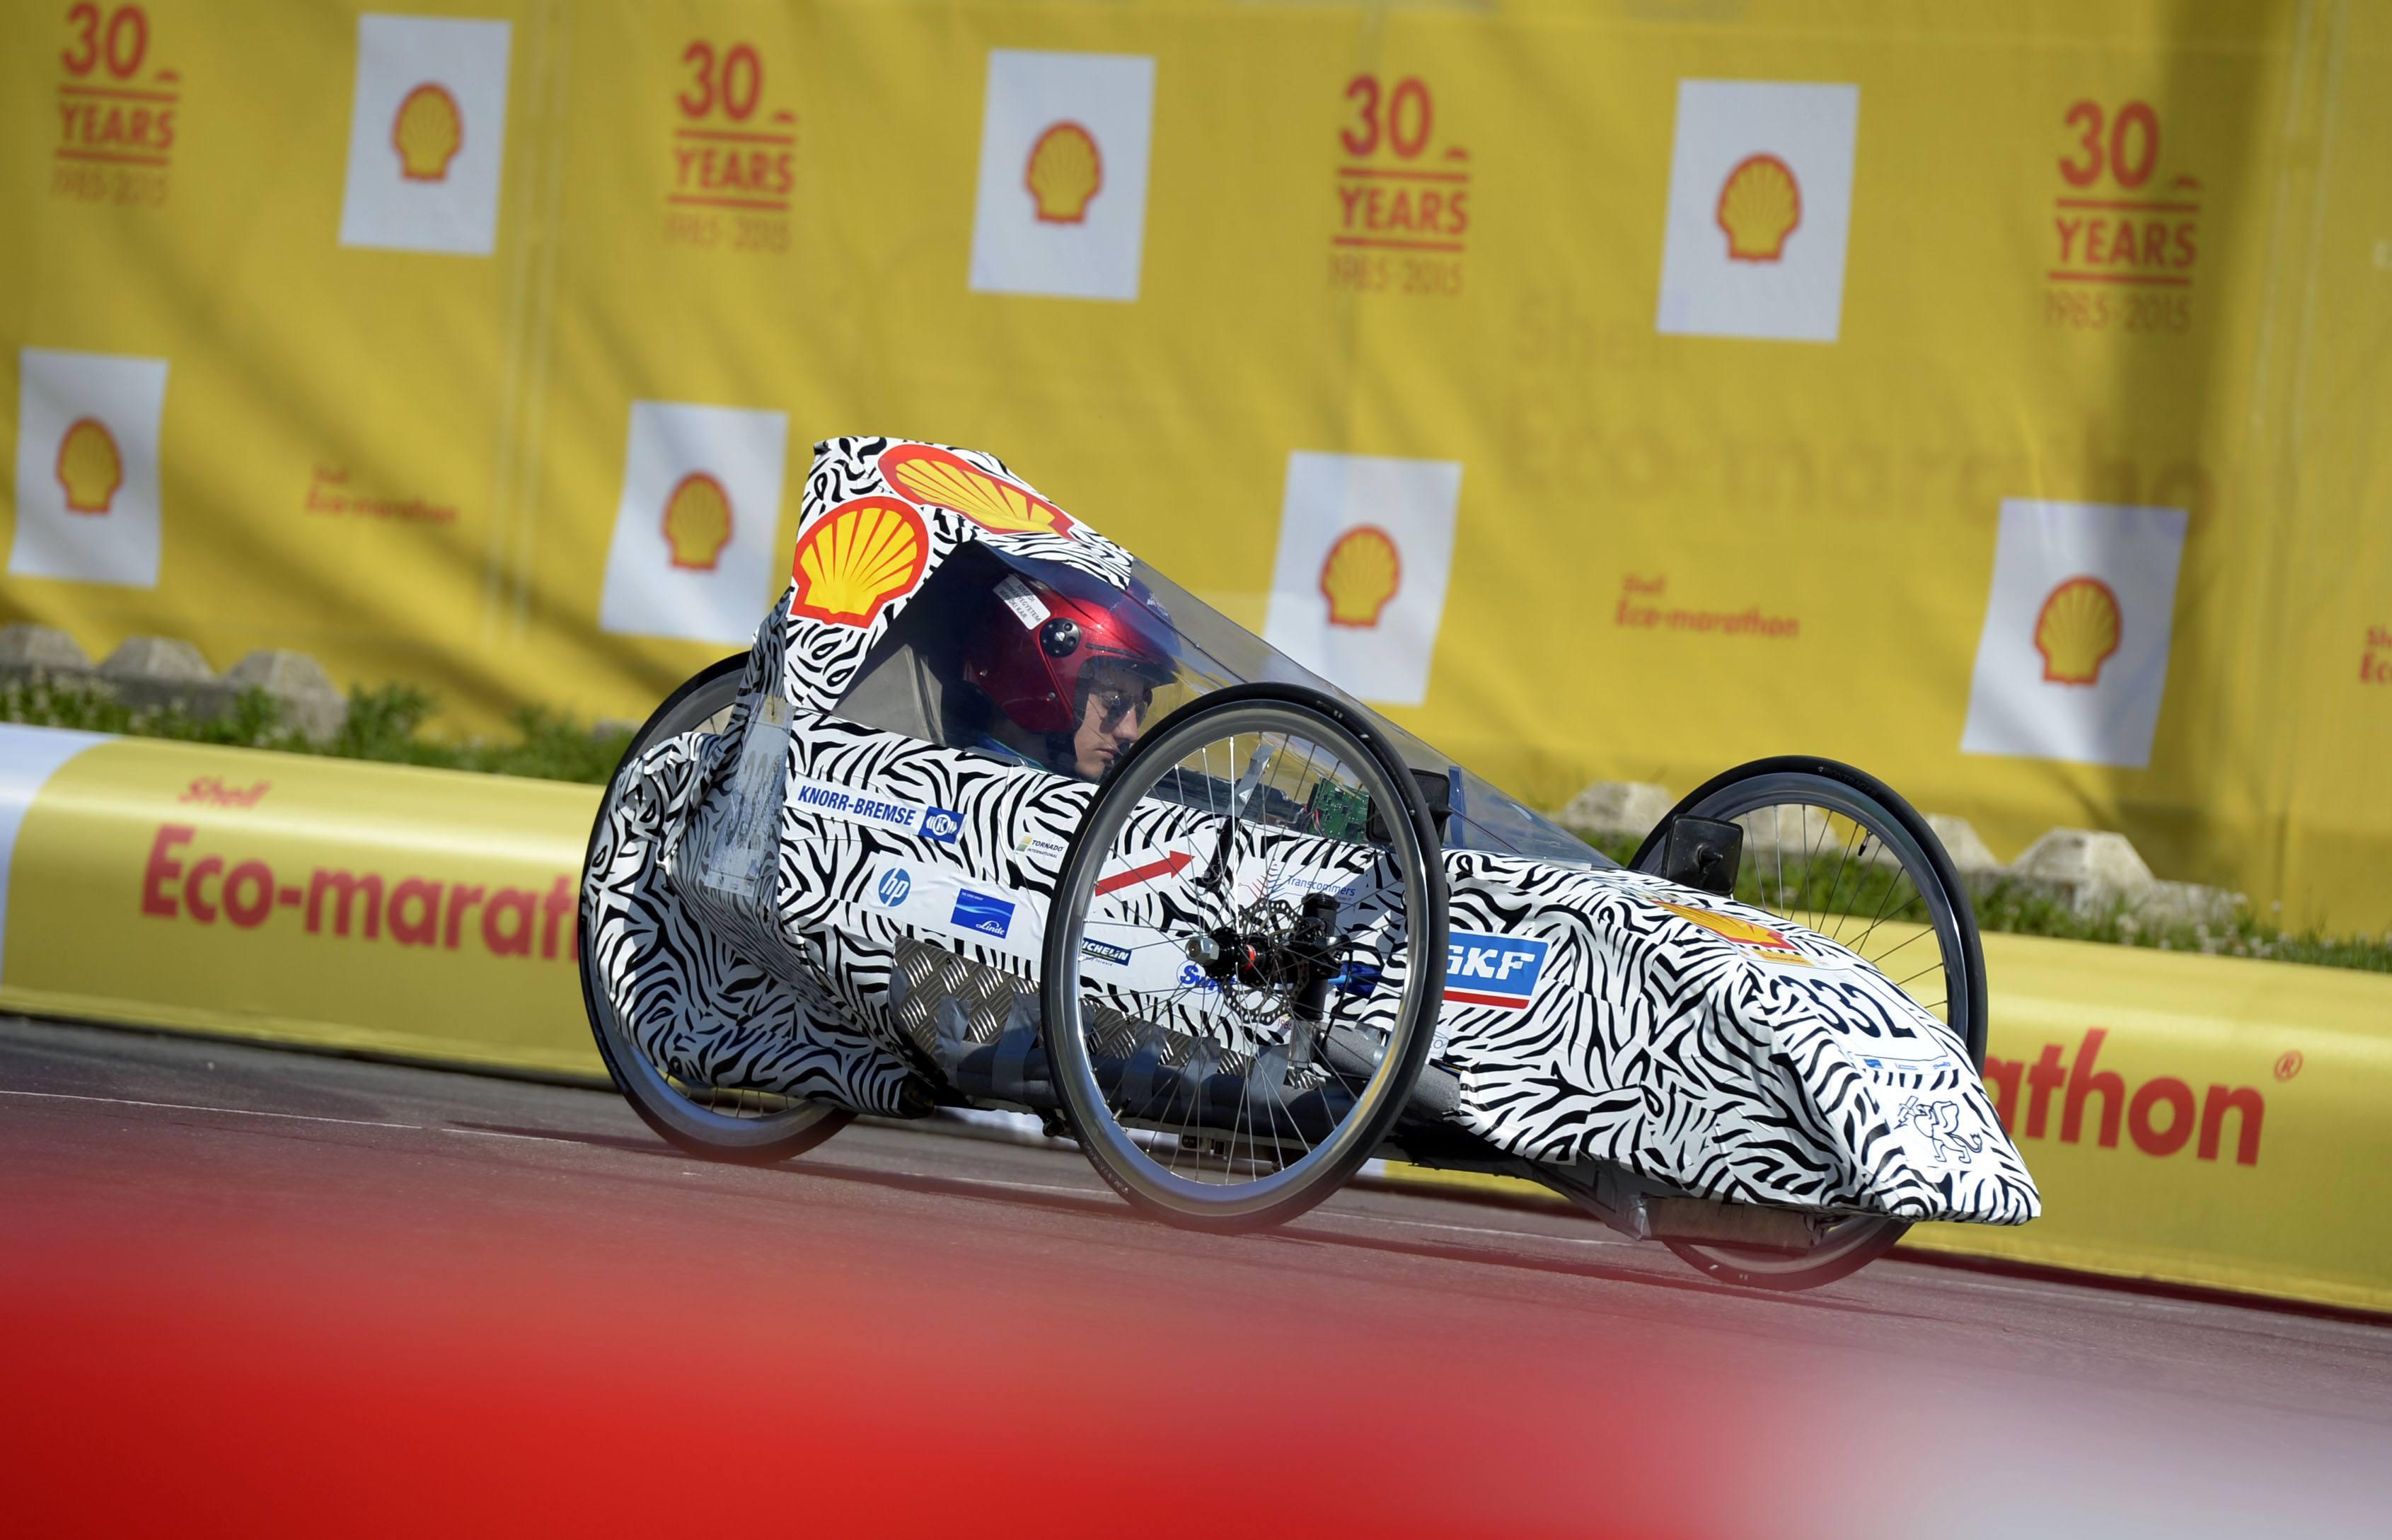 Shell Eco-marathon Europe 2015 Final Day